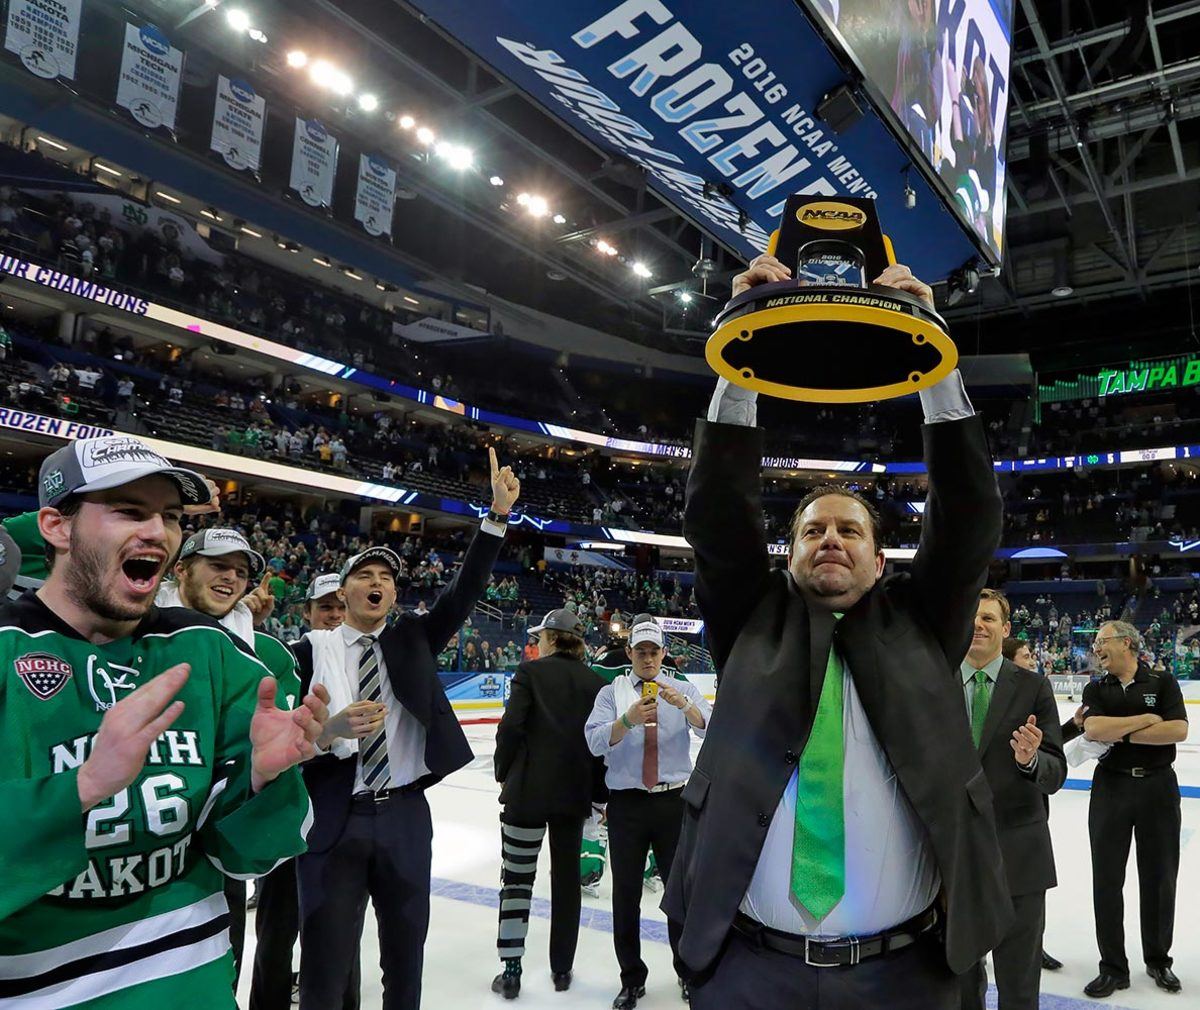 2016-0409-Brad-Berry-NCAA-hokcey-college-championship.jpg